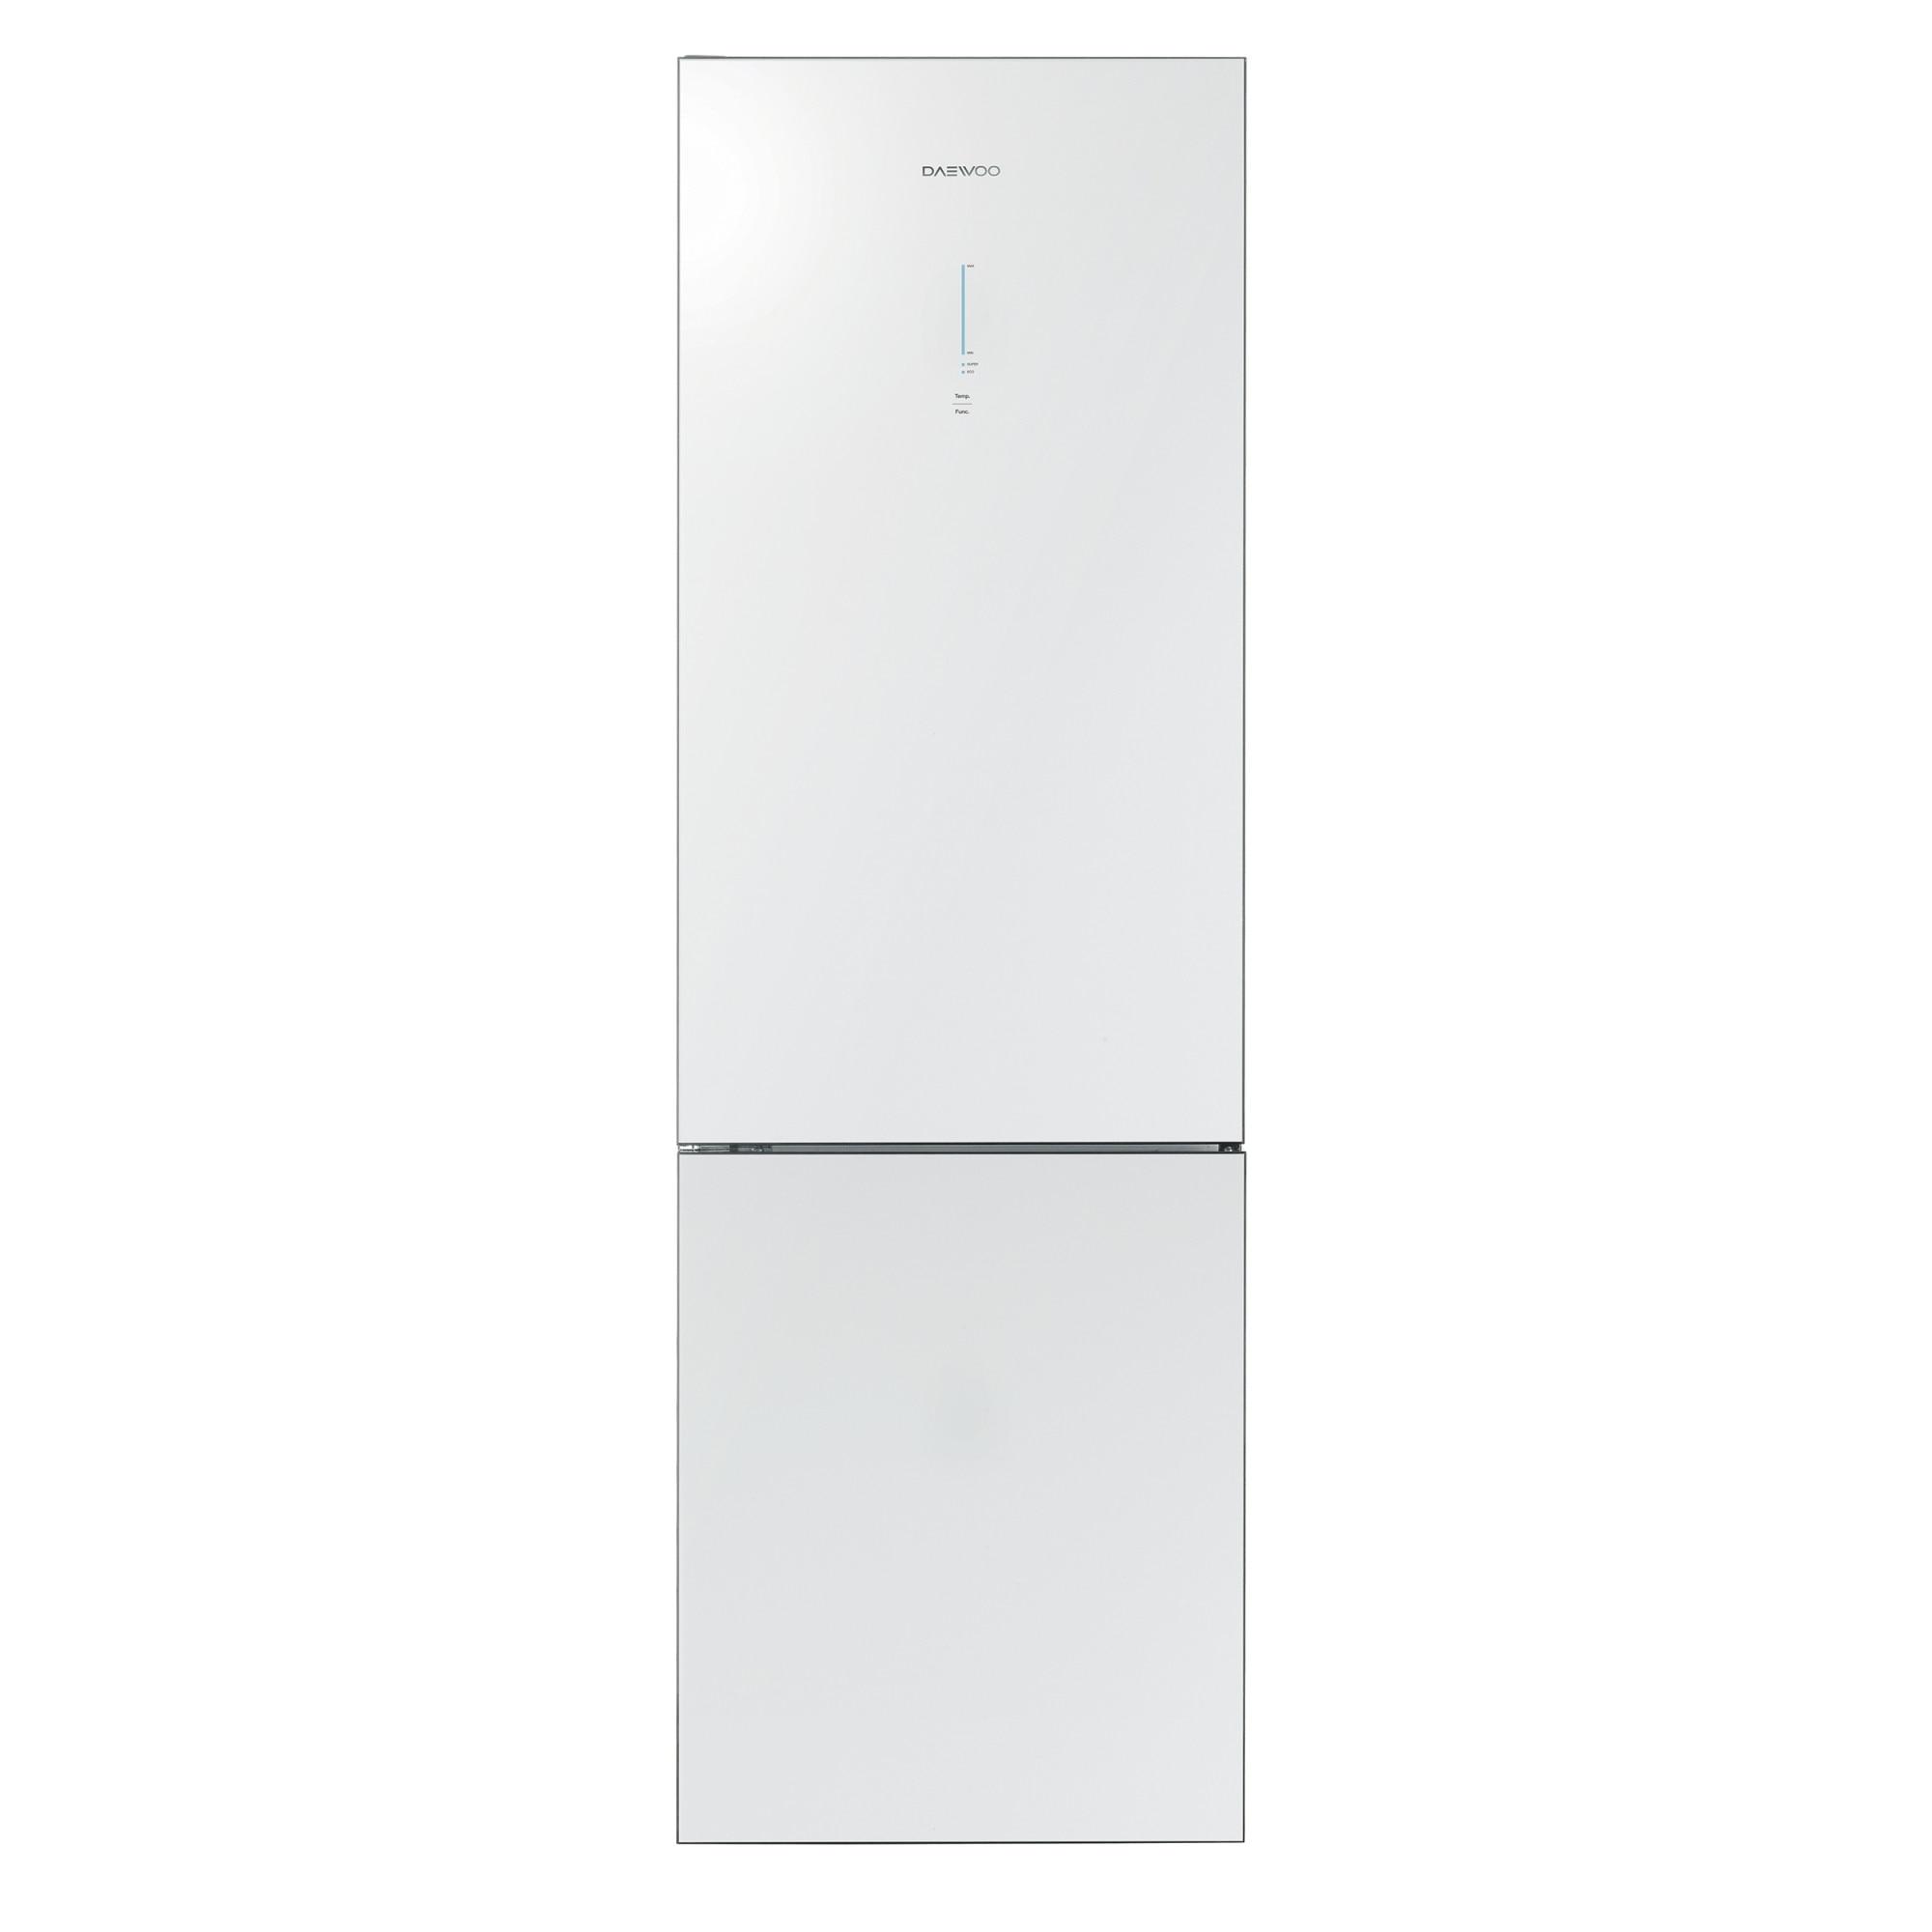 Fotografie Combina frigorifica Daewoo RN-T425RNW, 332l, Clasa A+, No Frost, H 189.8 cm, Sticla alba